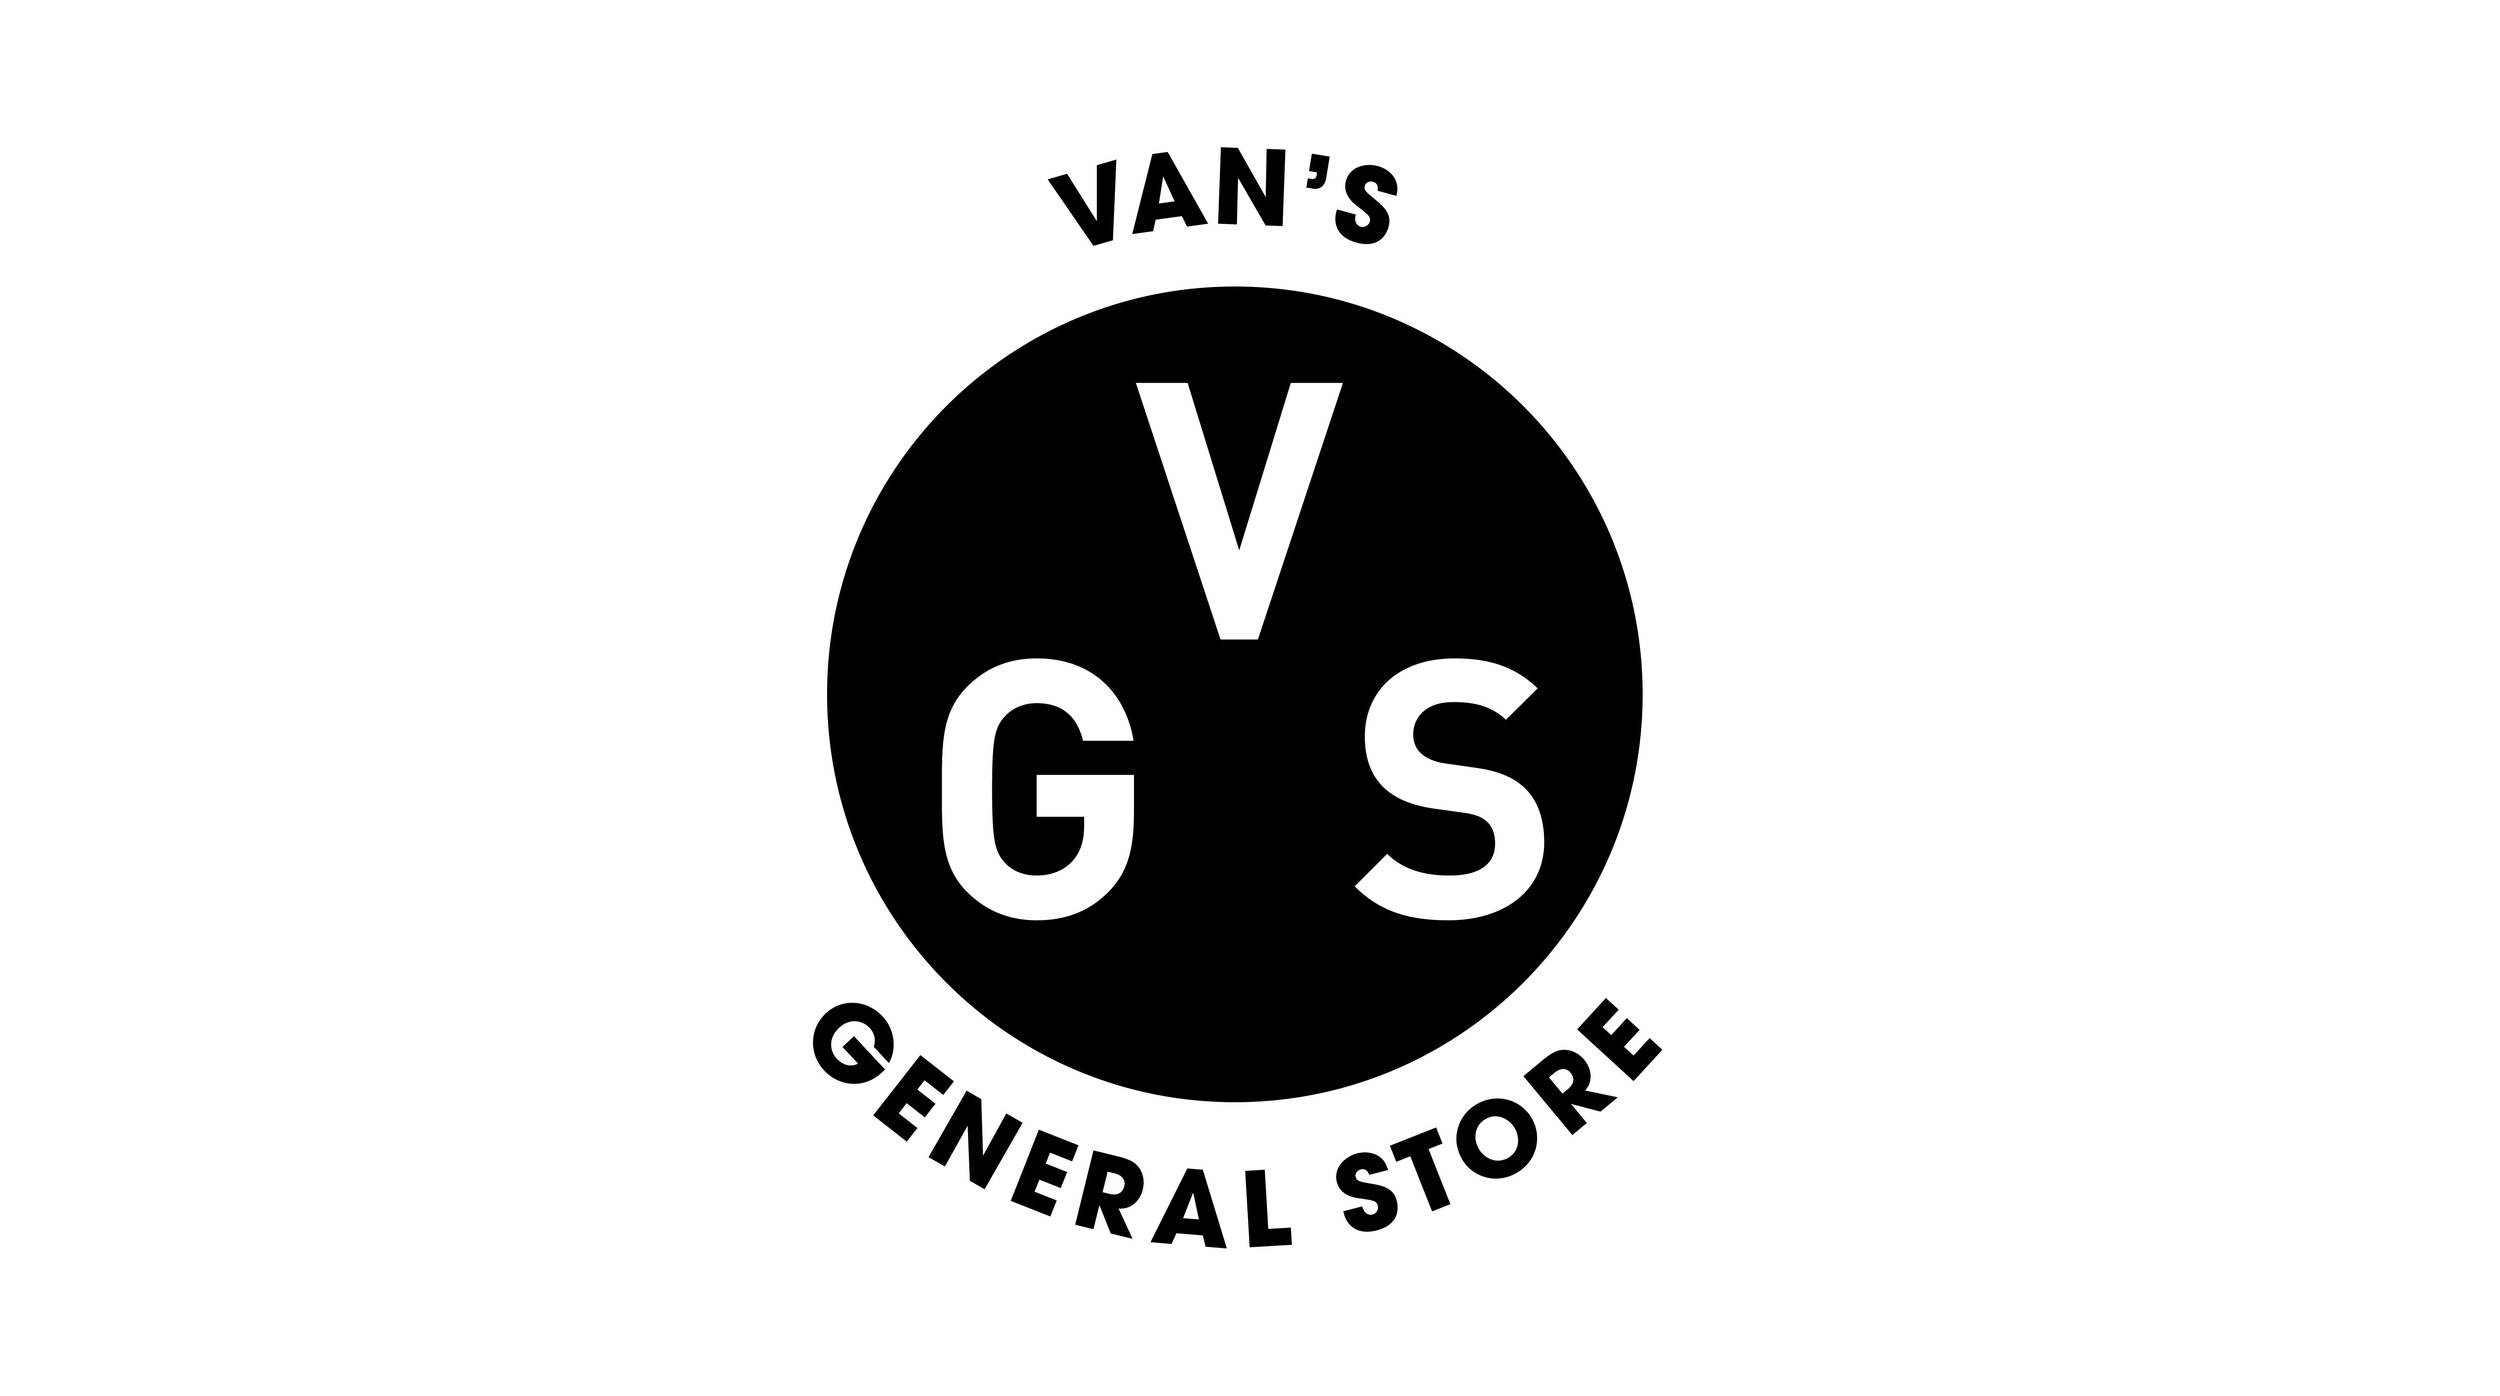 plan_a_partner_vans_general_store_logo.jpg